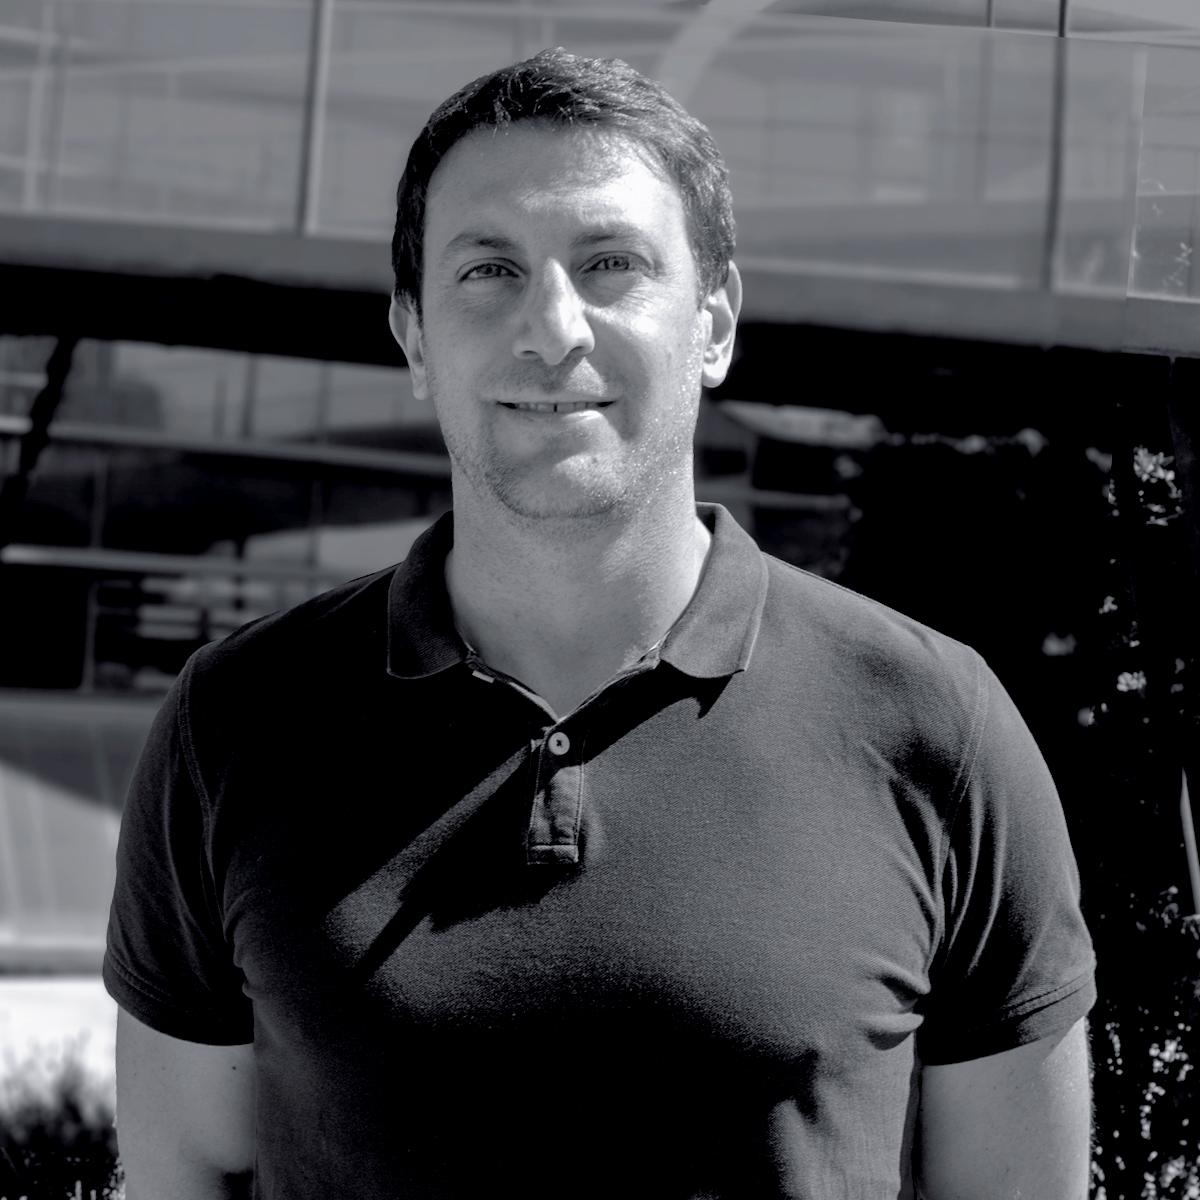 Felipe Martí Montava